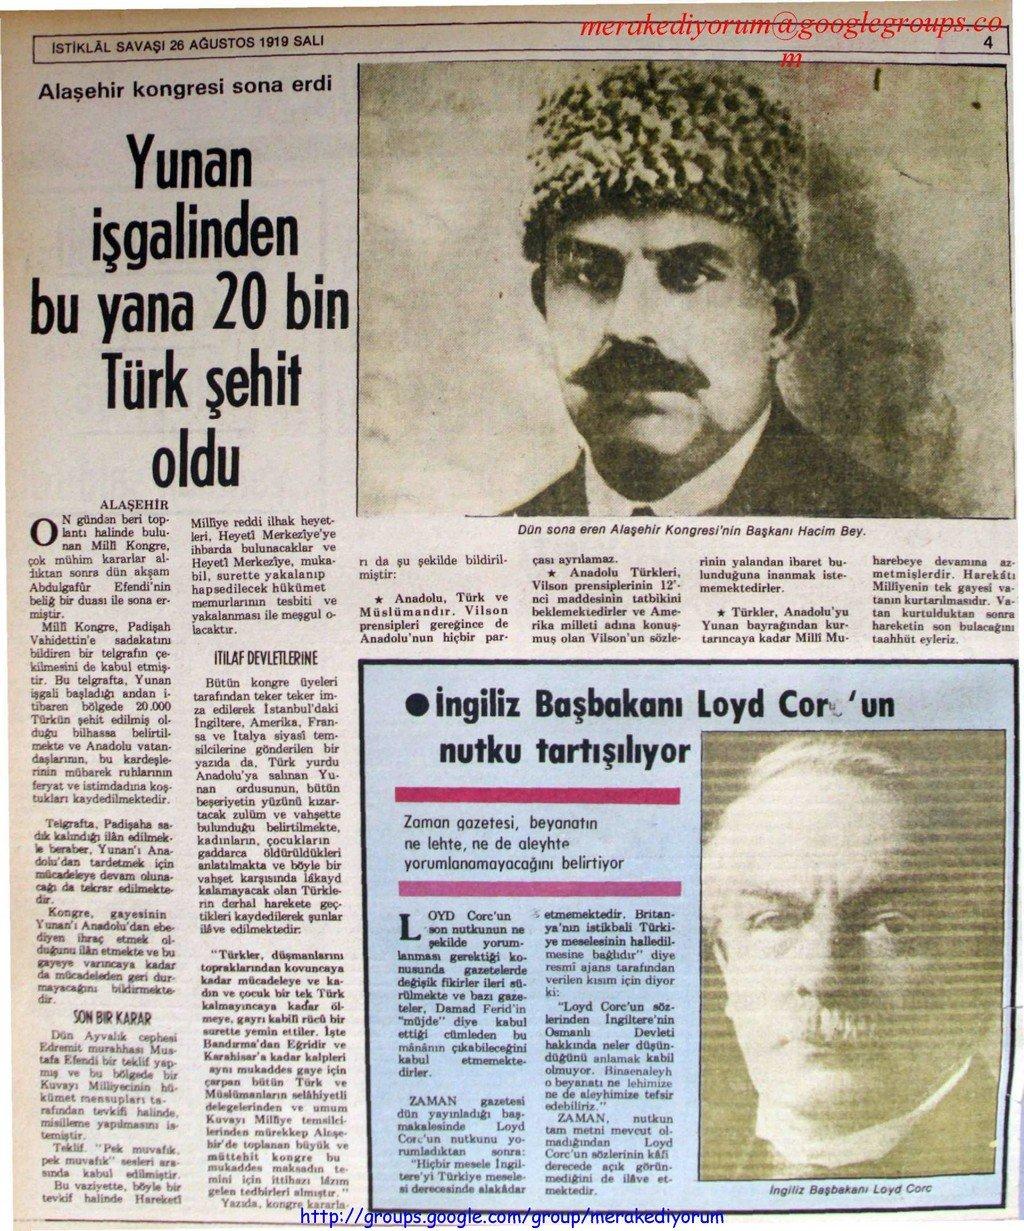 istiklal savaşı gazetesi - 26 ağustos 1919